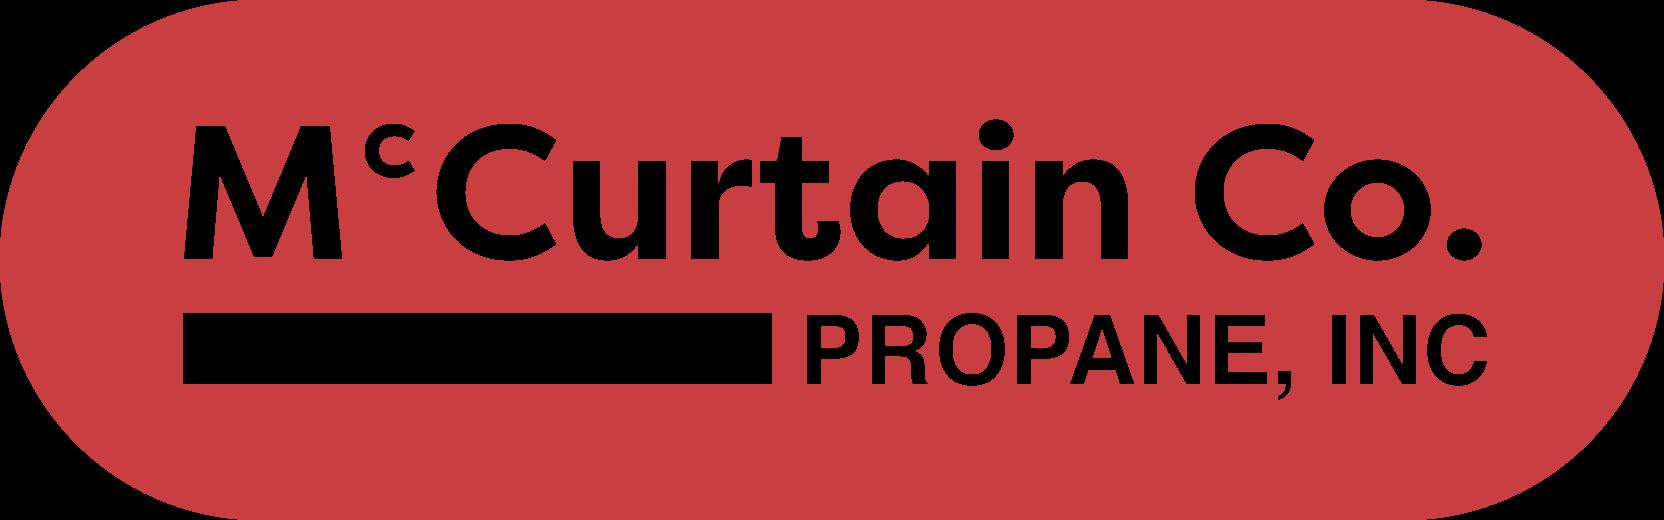 McCurtain County Propane Logo